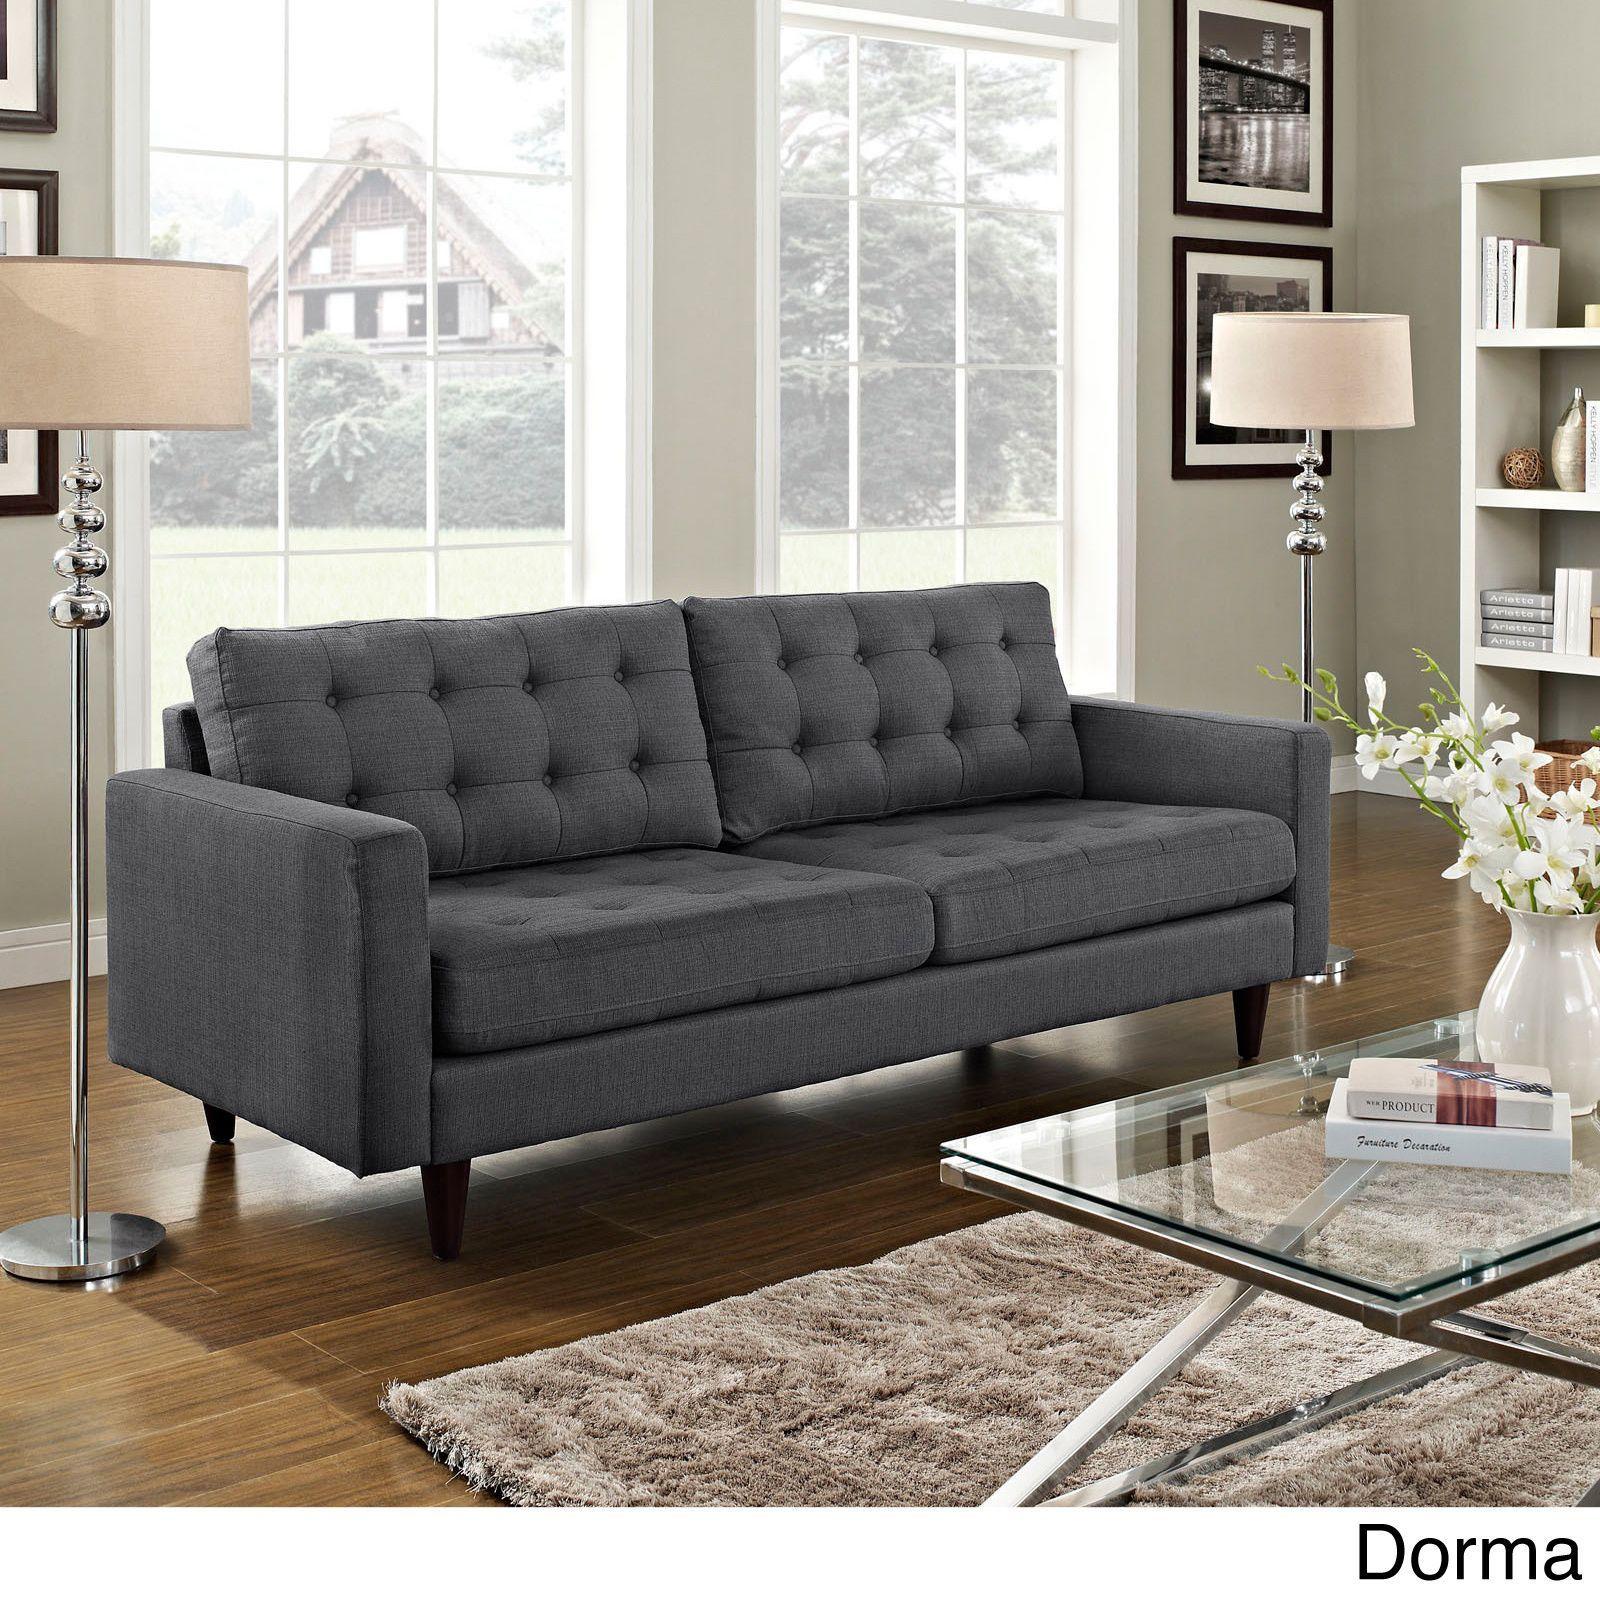 empress tufted upholstered sofa modern contemporary grey rh pinterest com